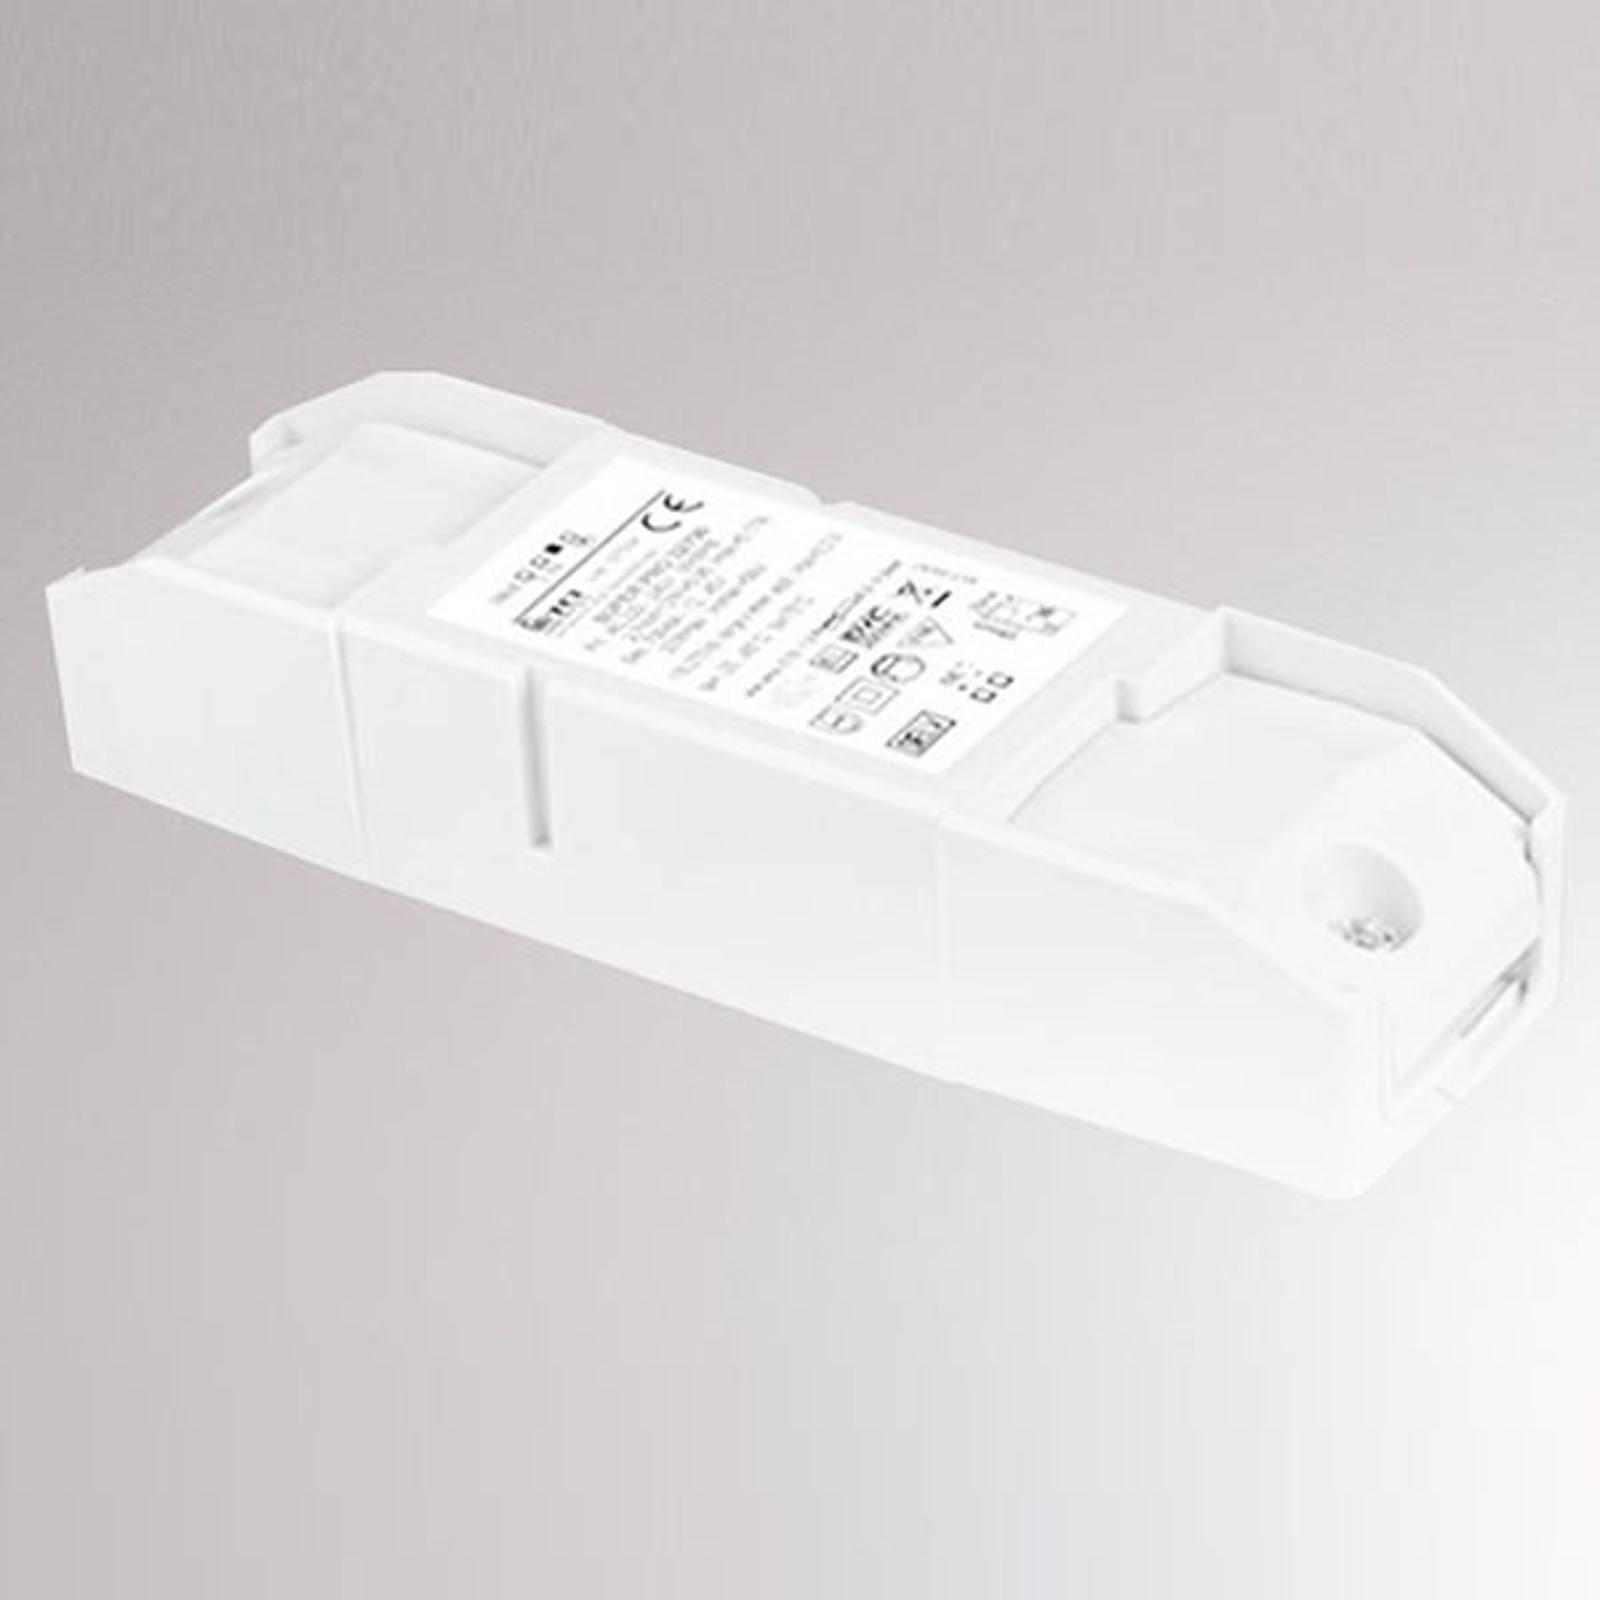 LOUM converter Super Pro23/500 voor Liro